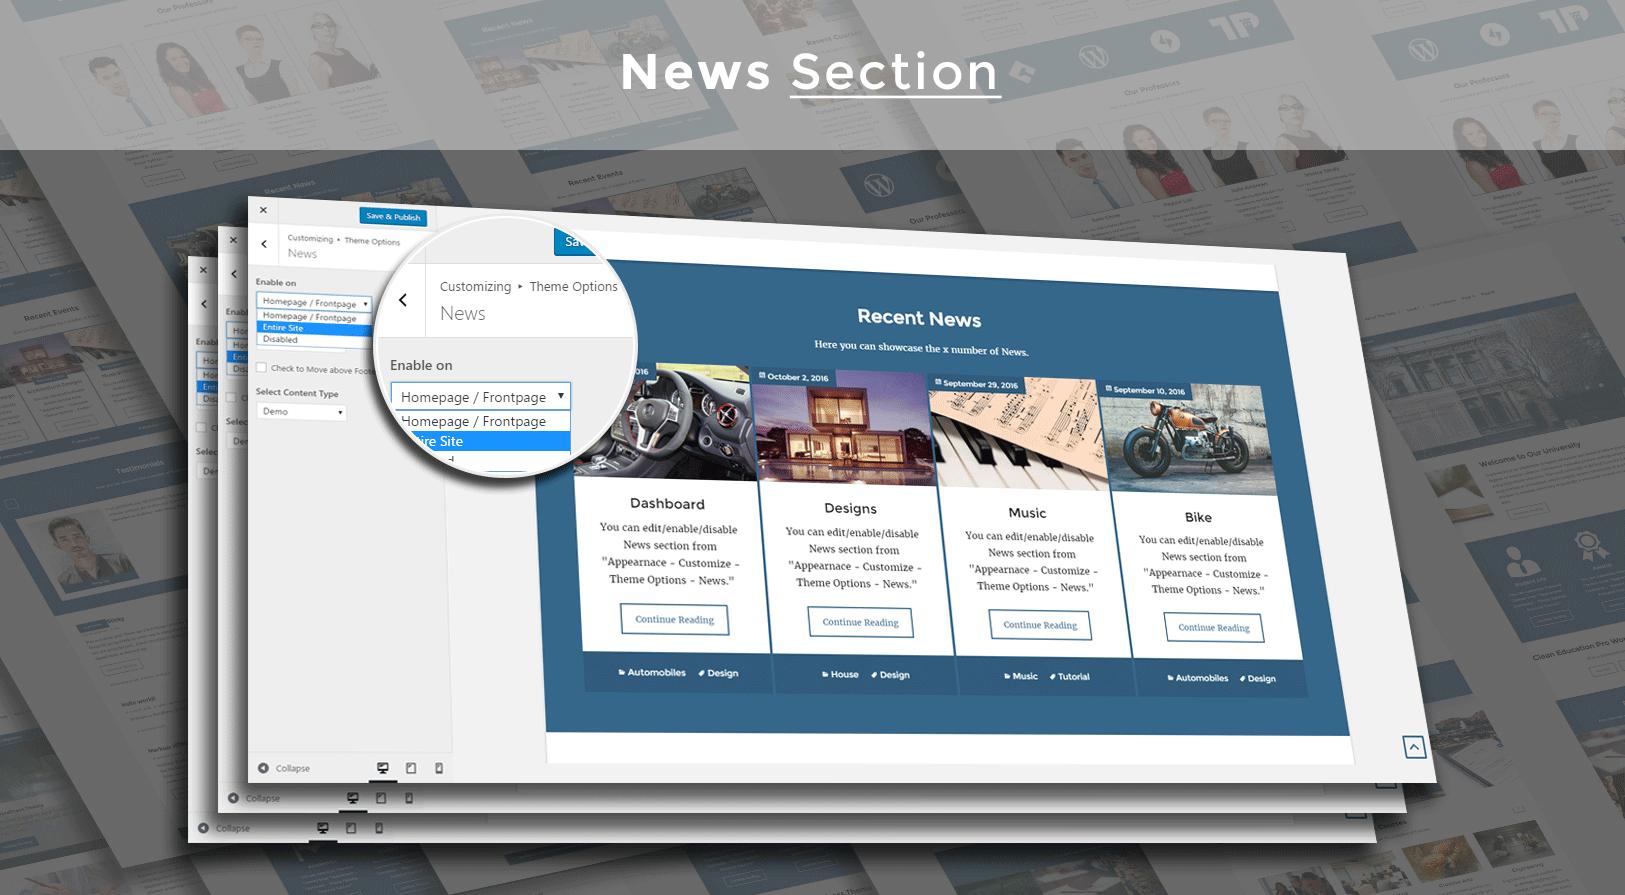 News Section Layout Screenshot